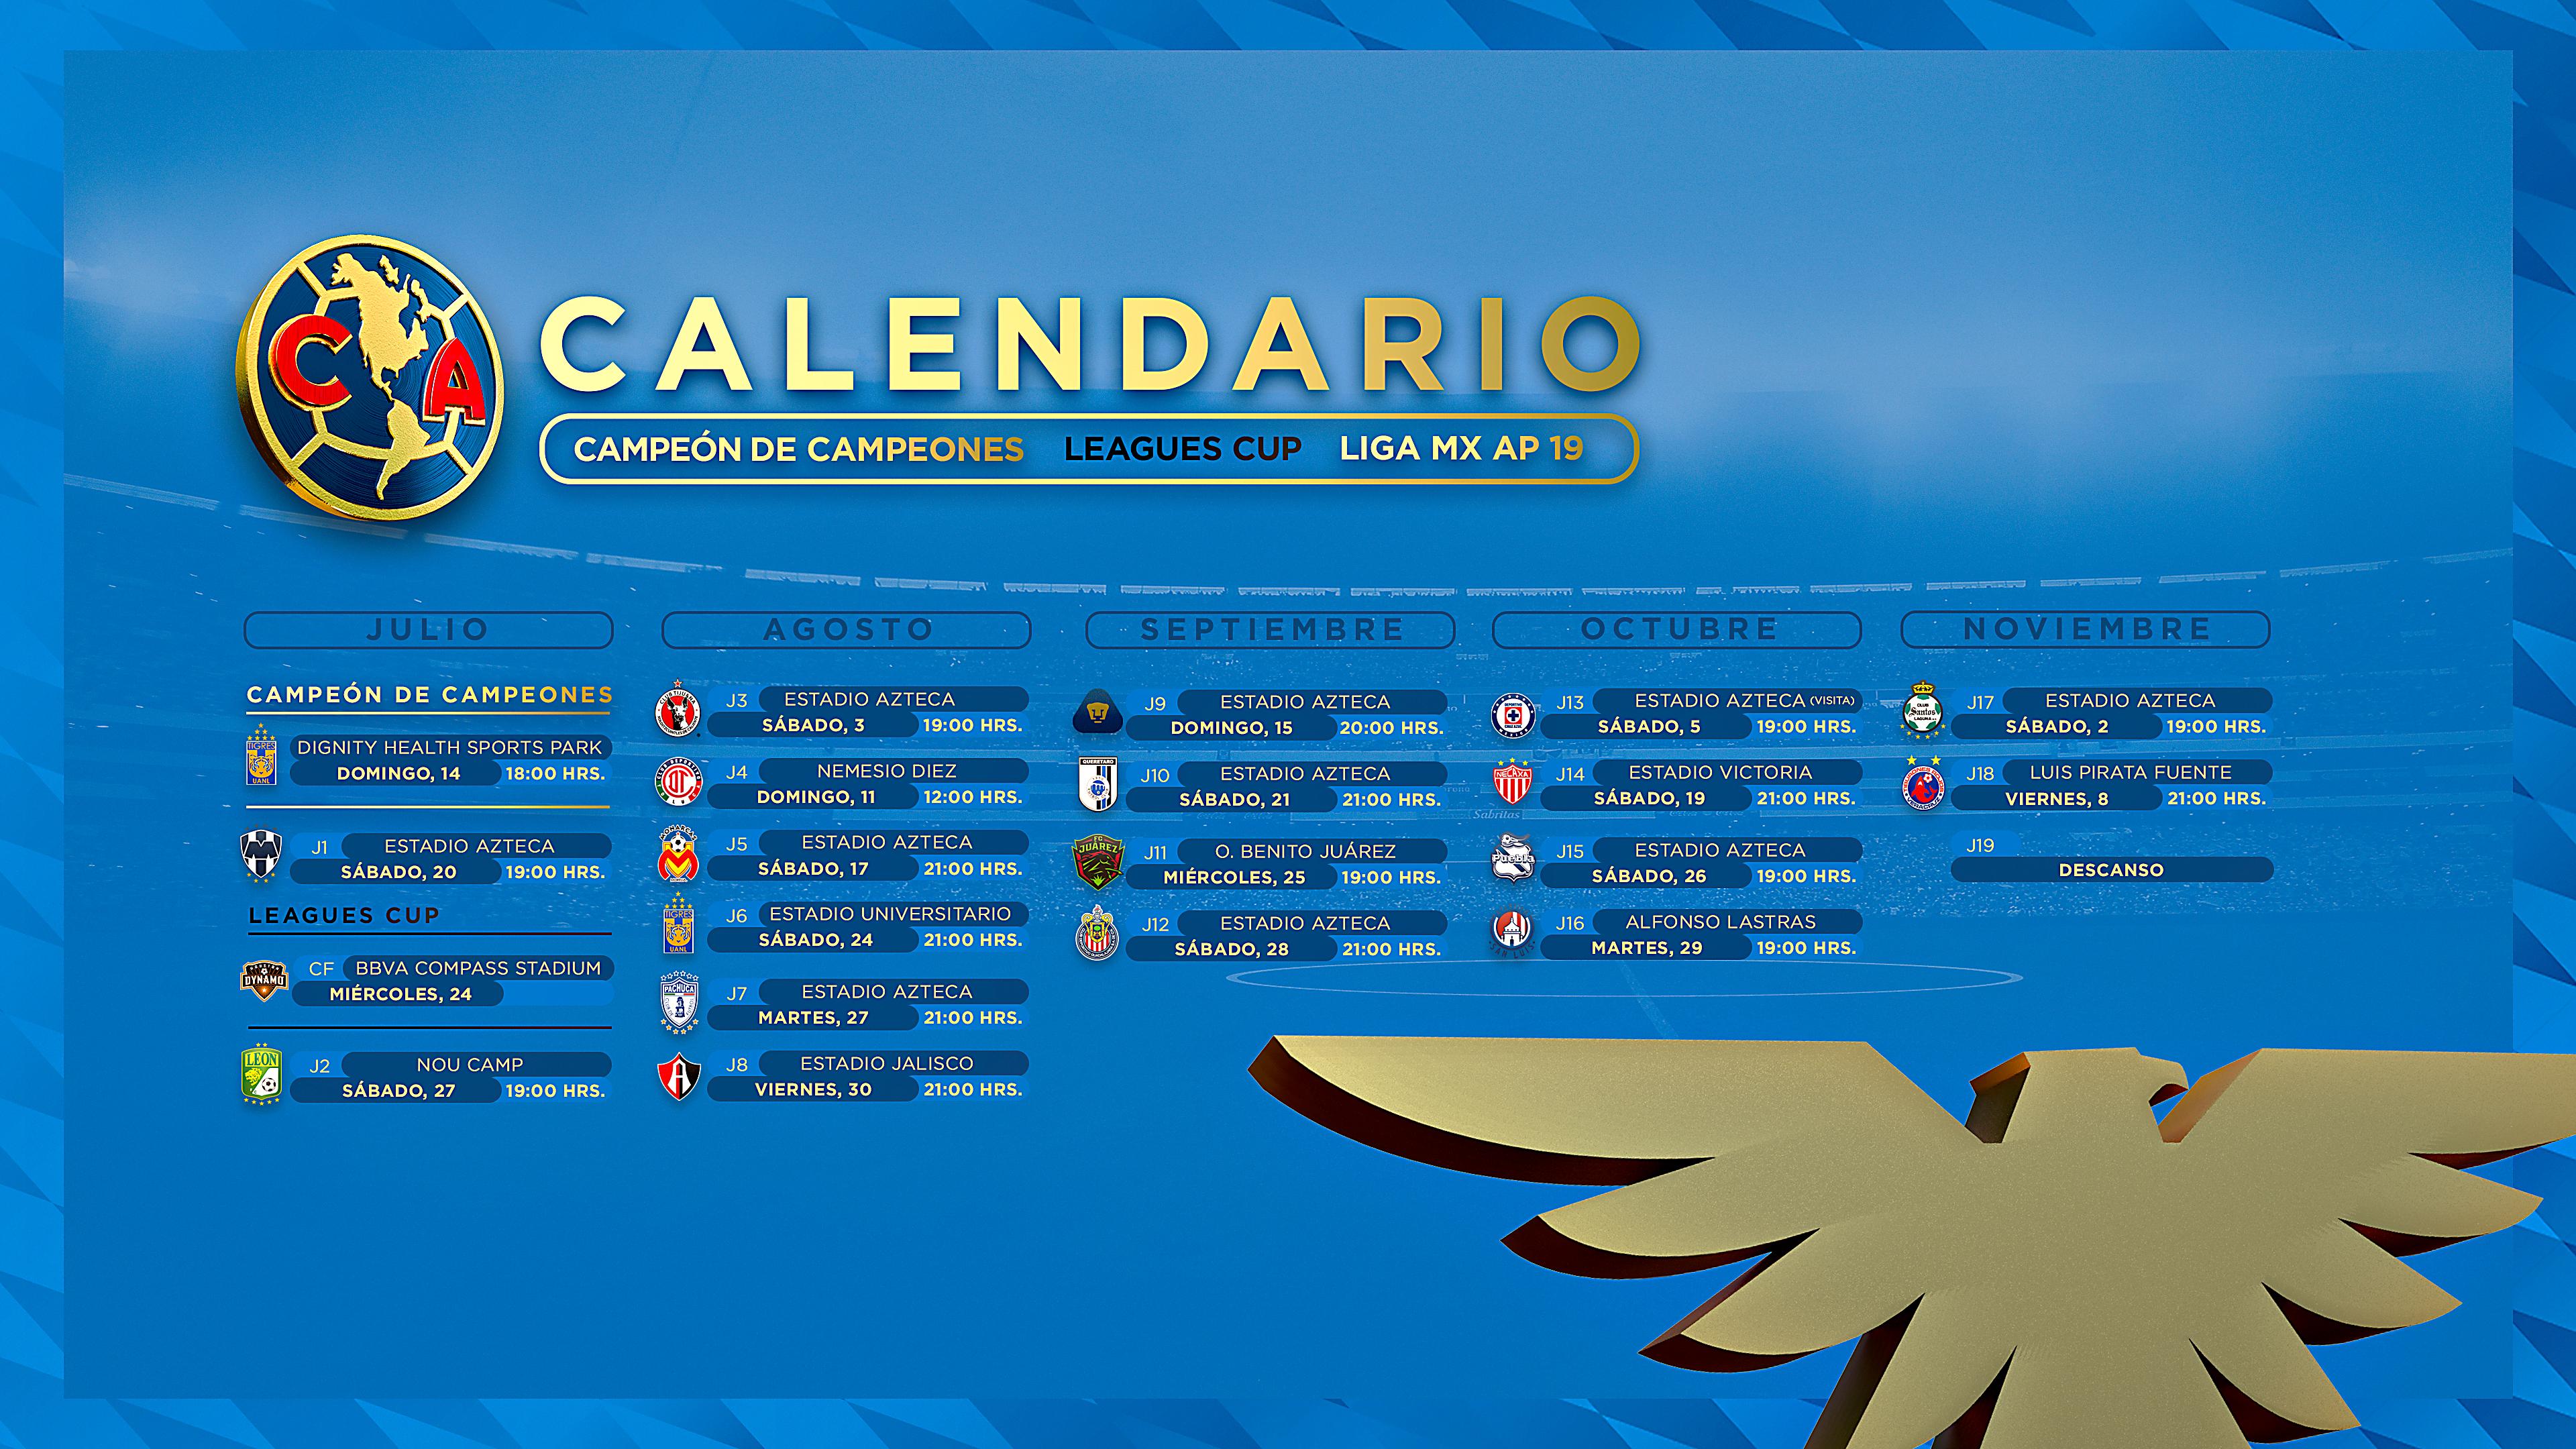 Calendario Julio 20019.Calendario Club America Apertura 2019 Club America Sitio